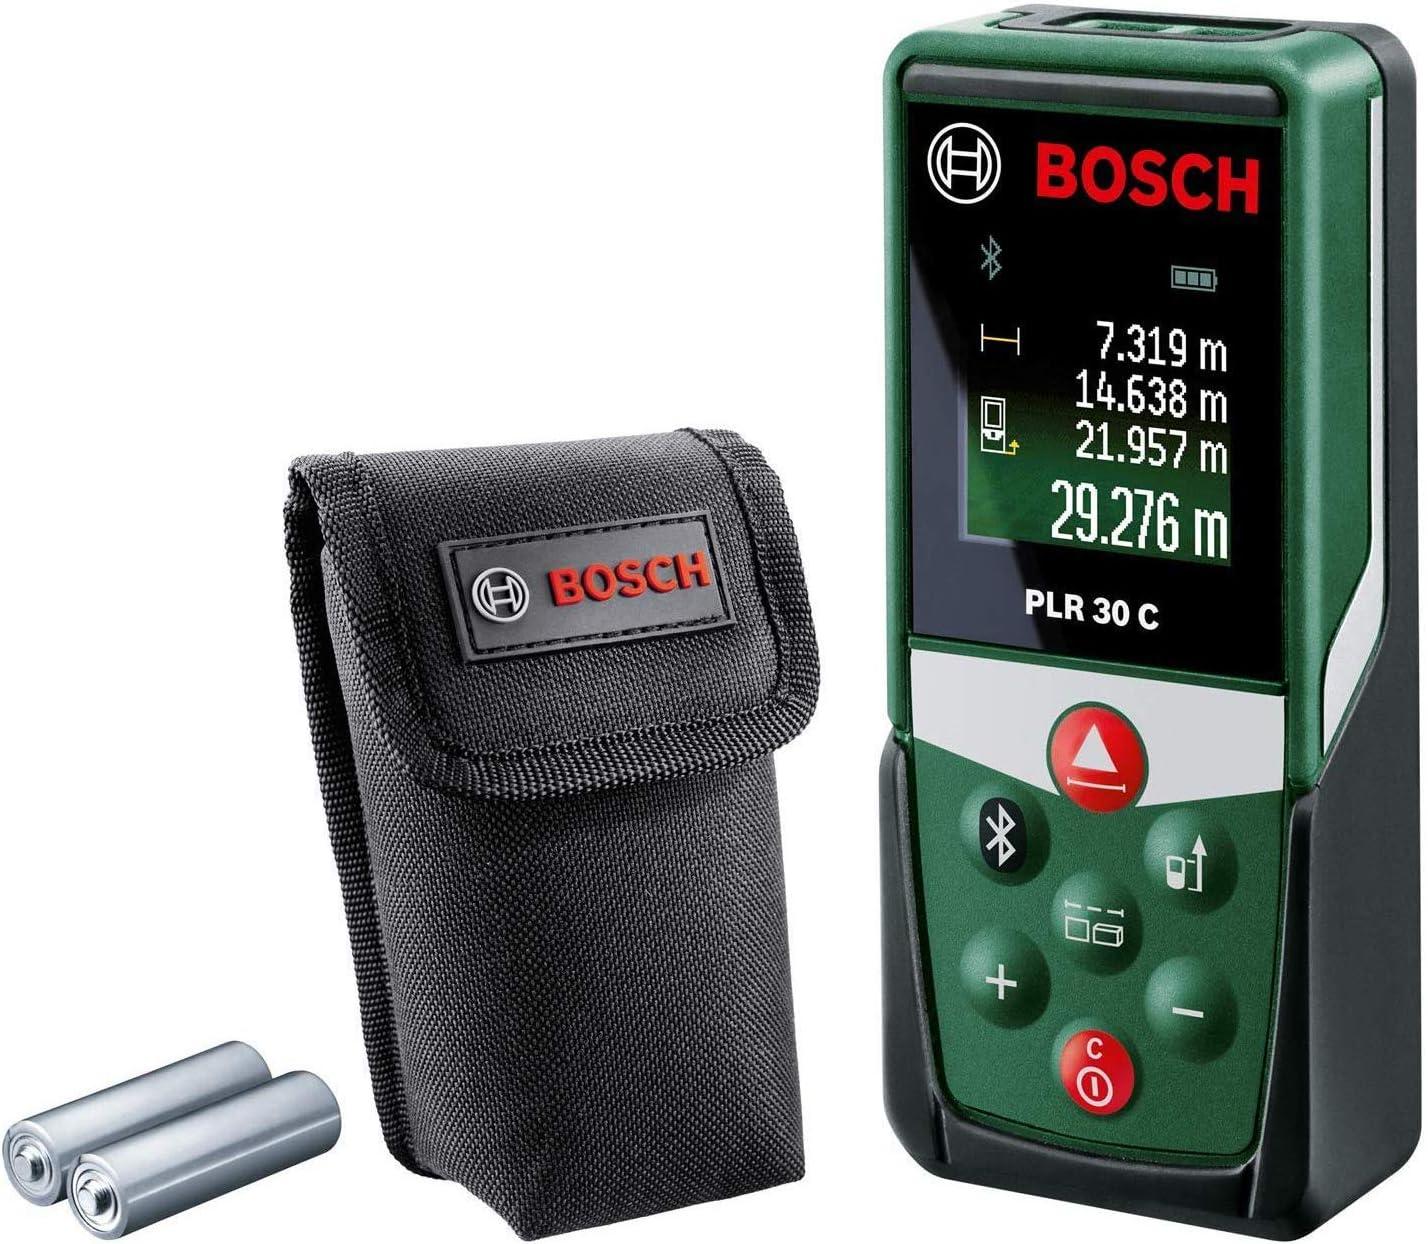 Bosch medidor láser PLR 30 C (con función de aplicación, rango de medición: 0,05–30m, precisión: ± 2mm, en caja)